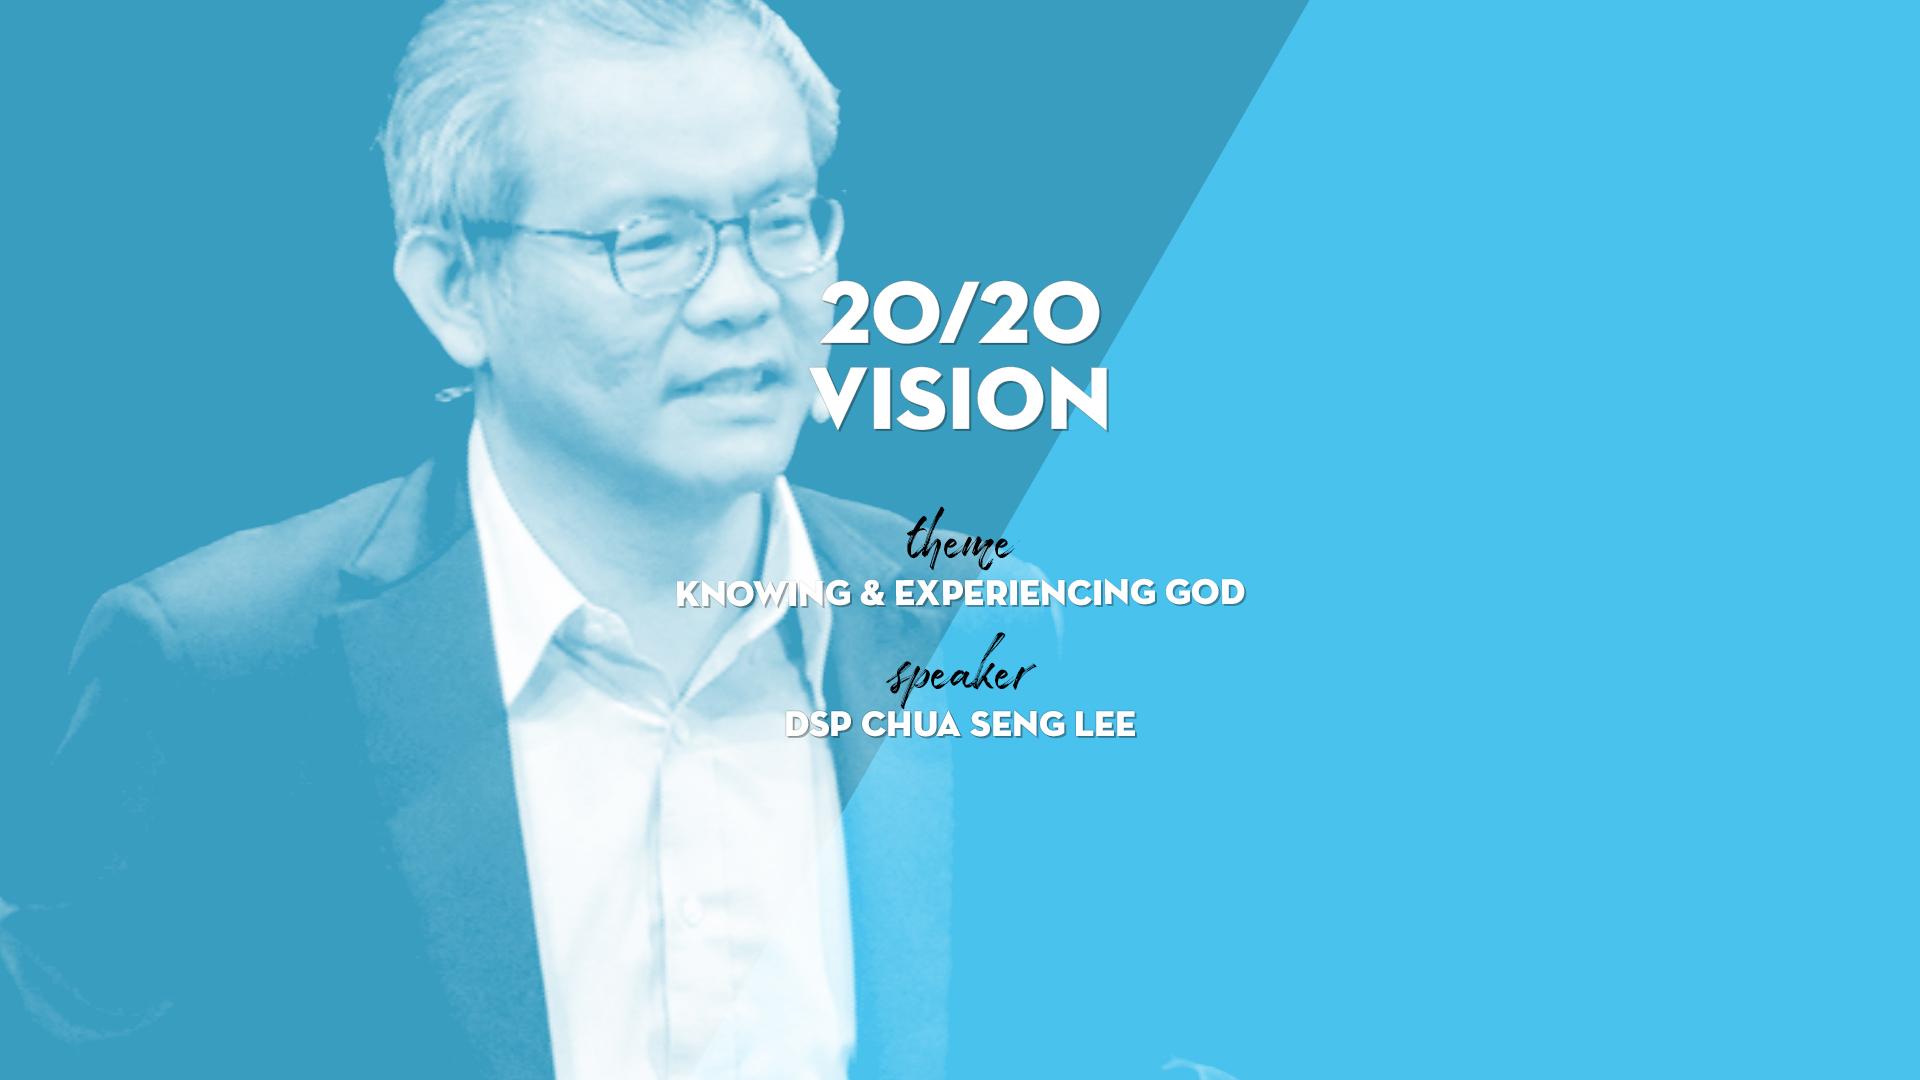 20 / 20 VISION